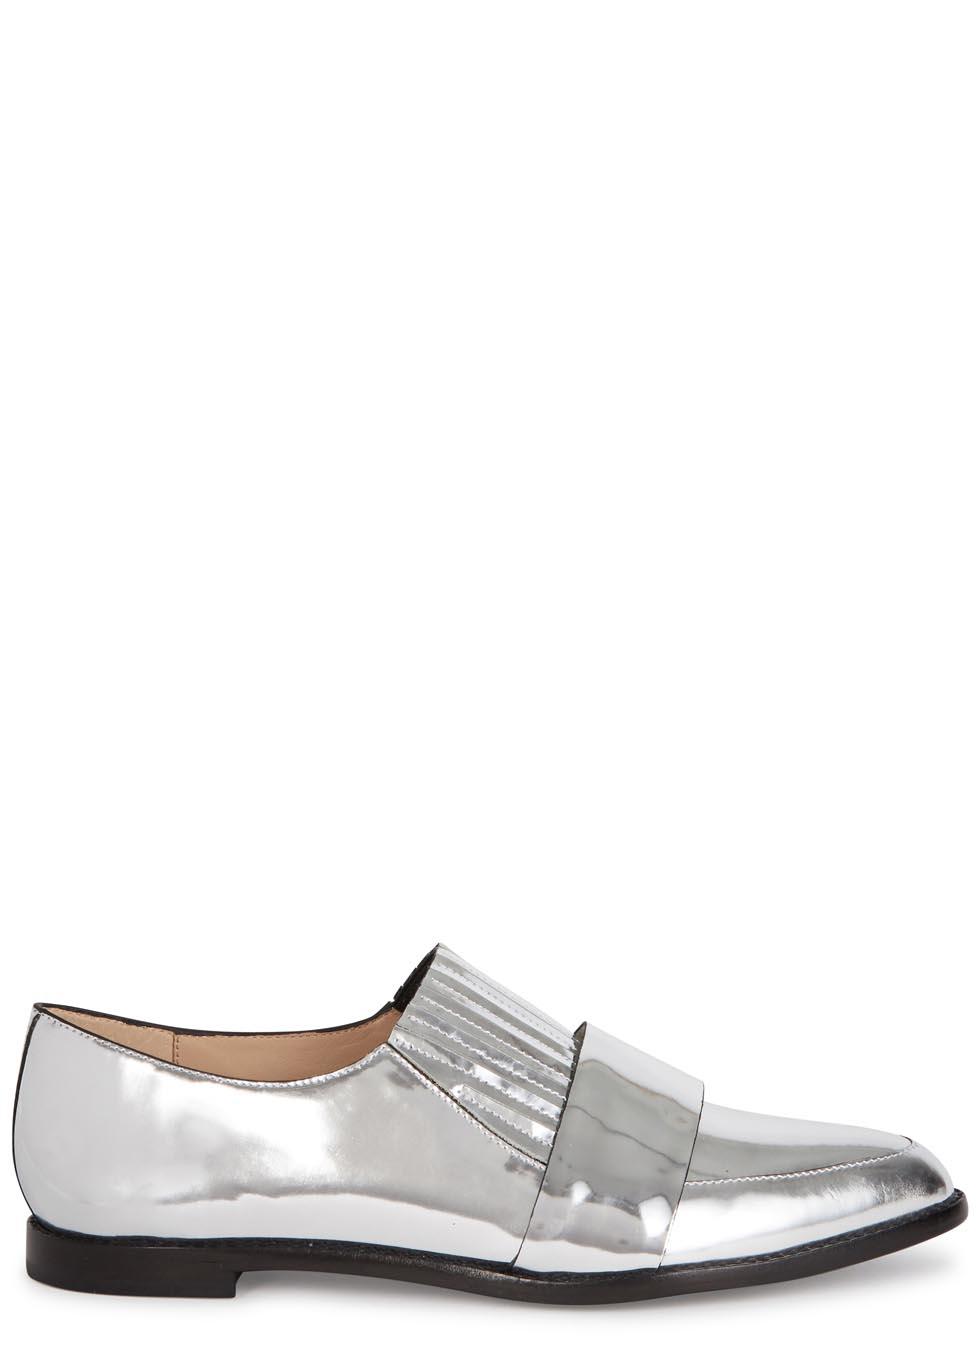 853949688e7 Loeffler Randall Rosa Silver Leather Loafers in Metallic - Lyst